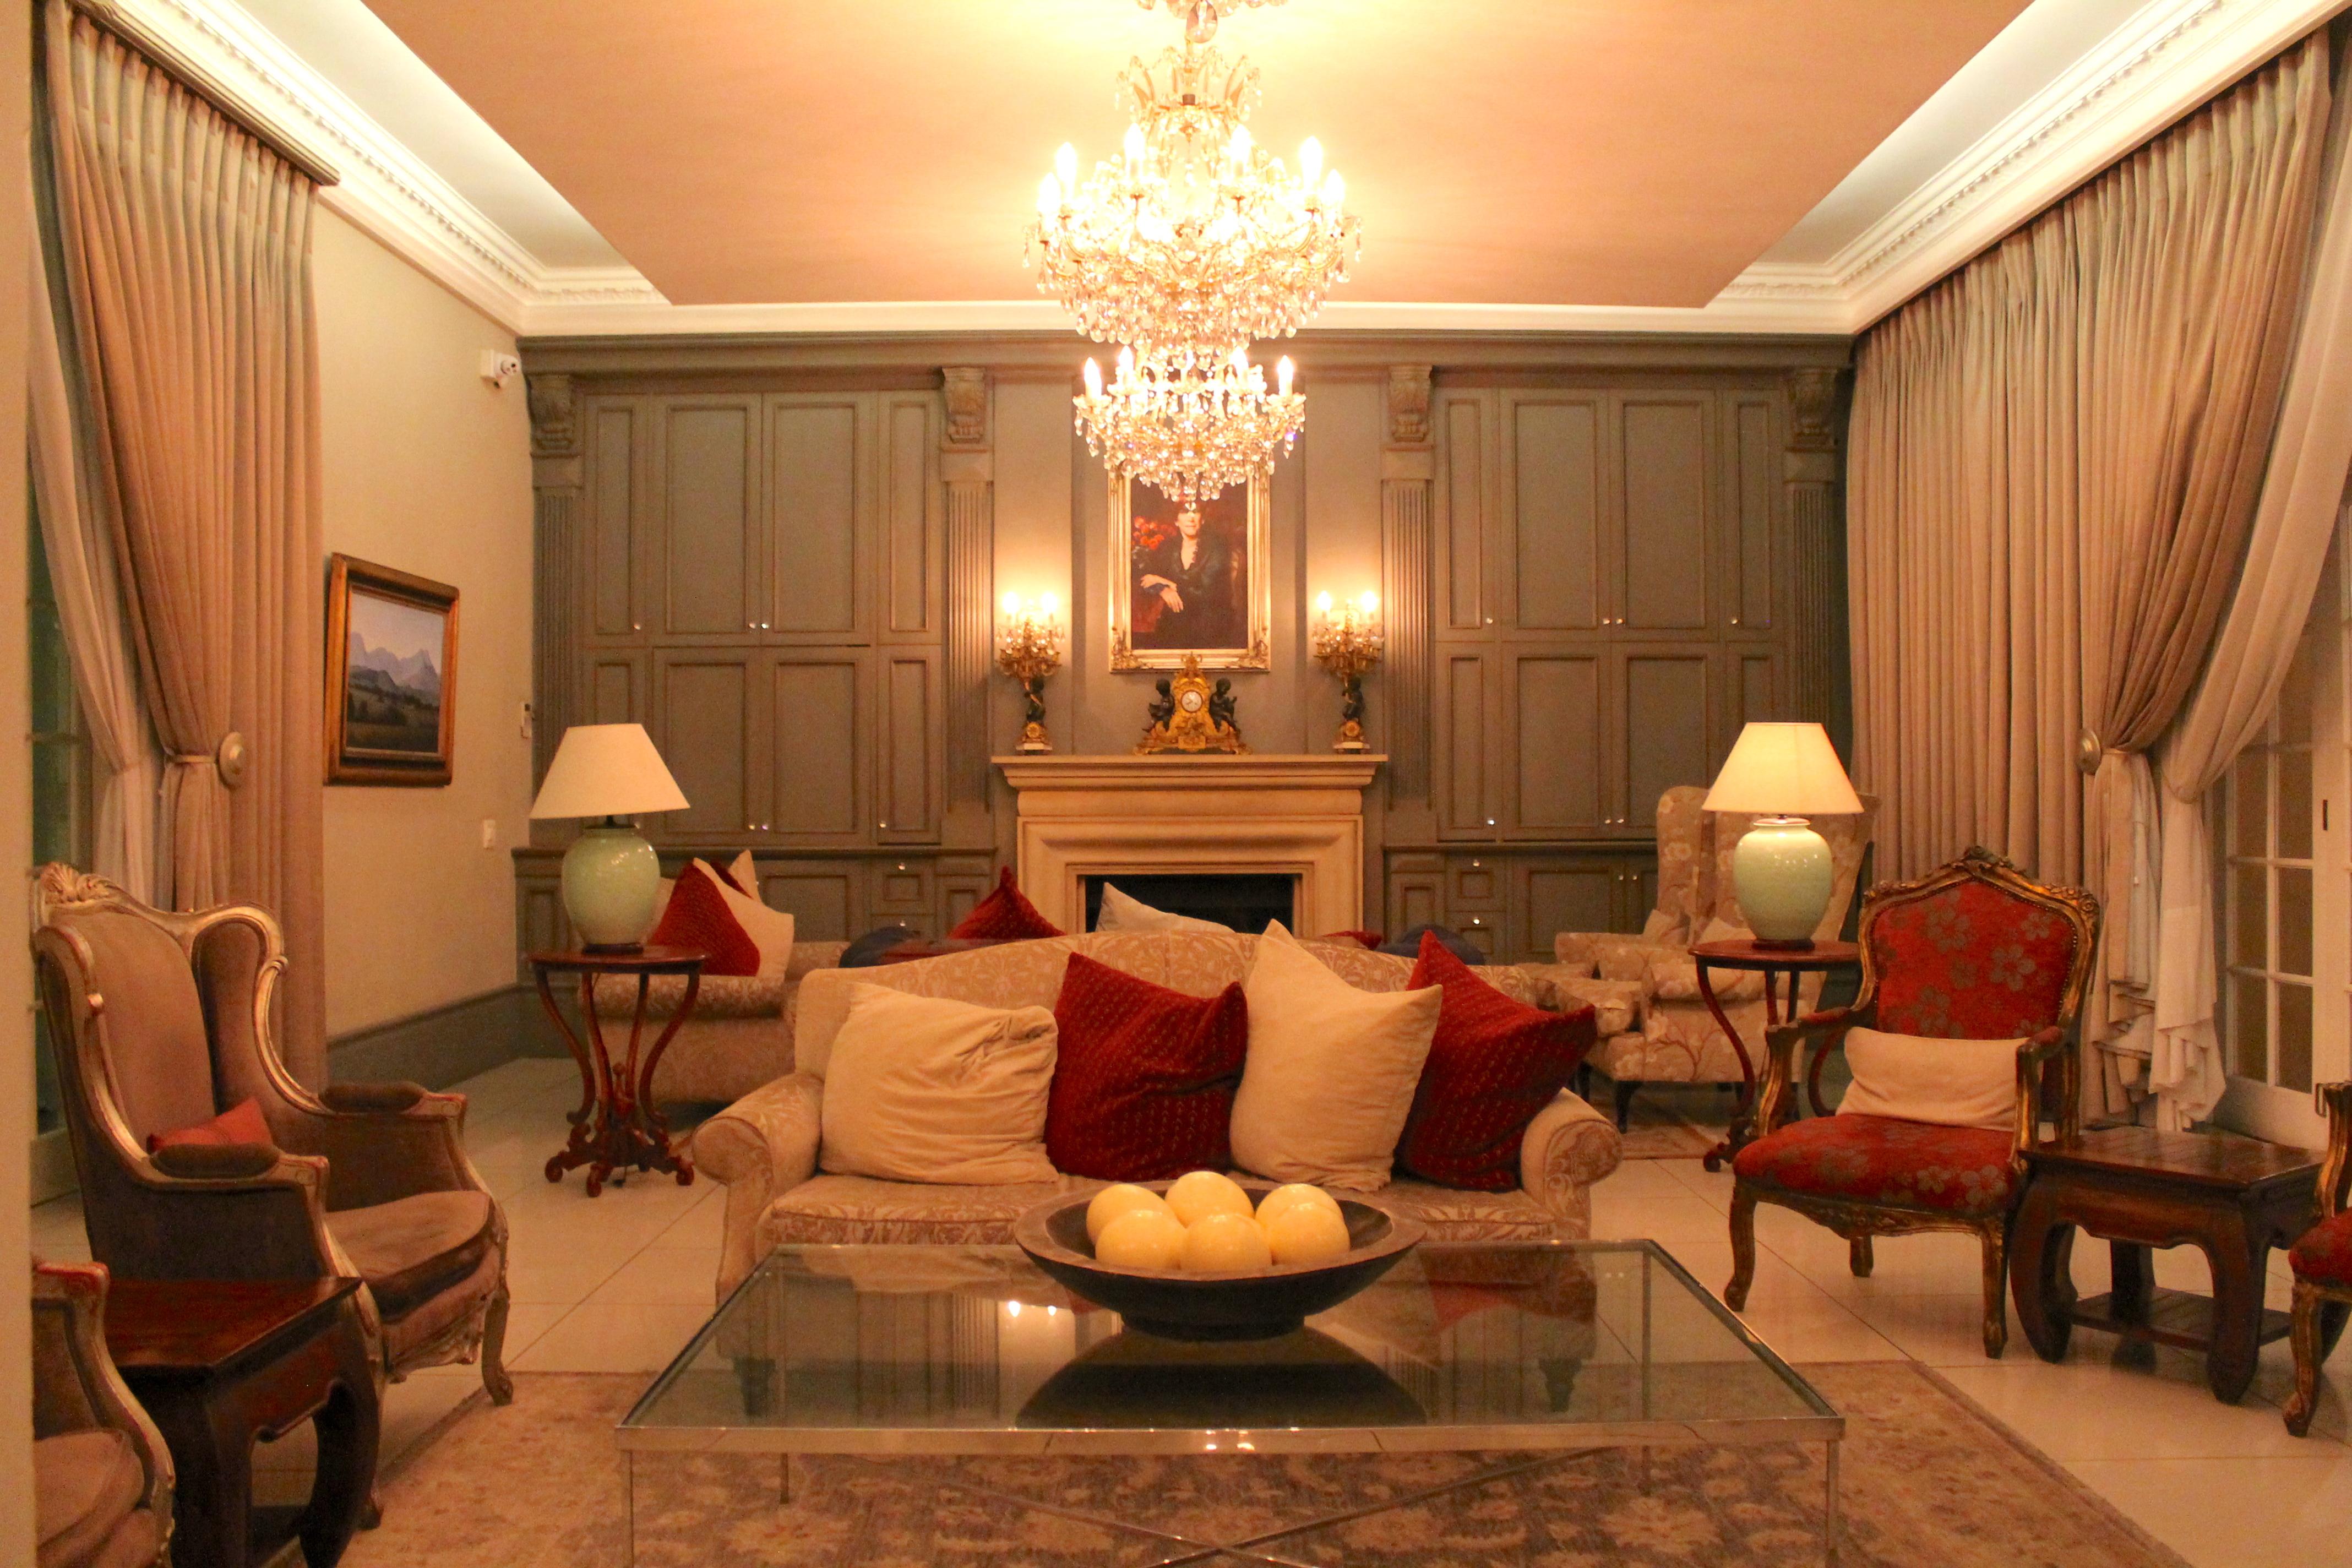 munro-hotel-livingroom-lustforthesublime